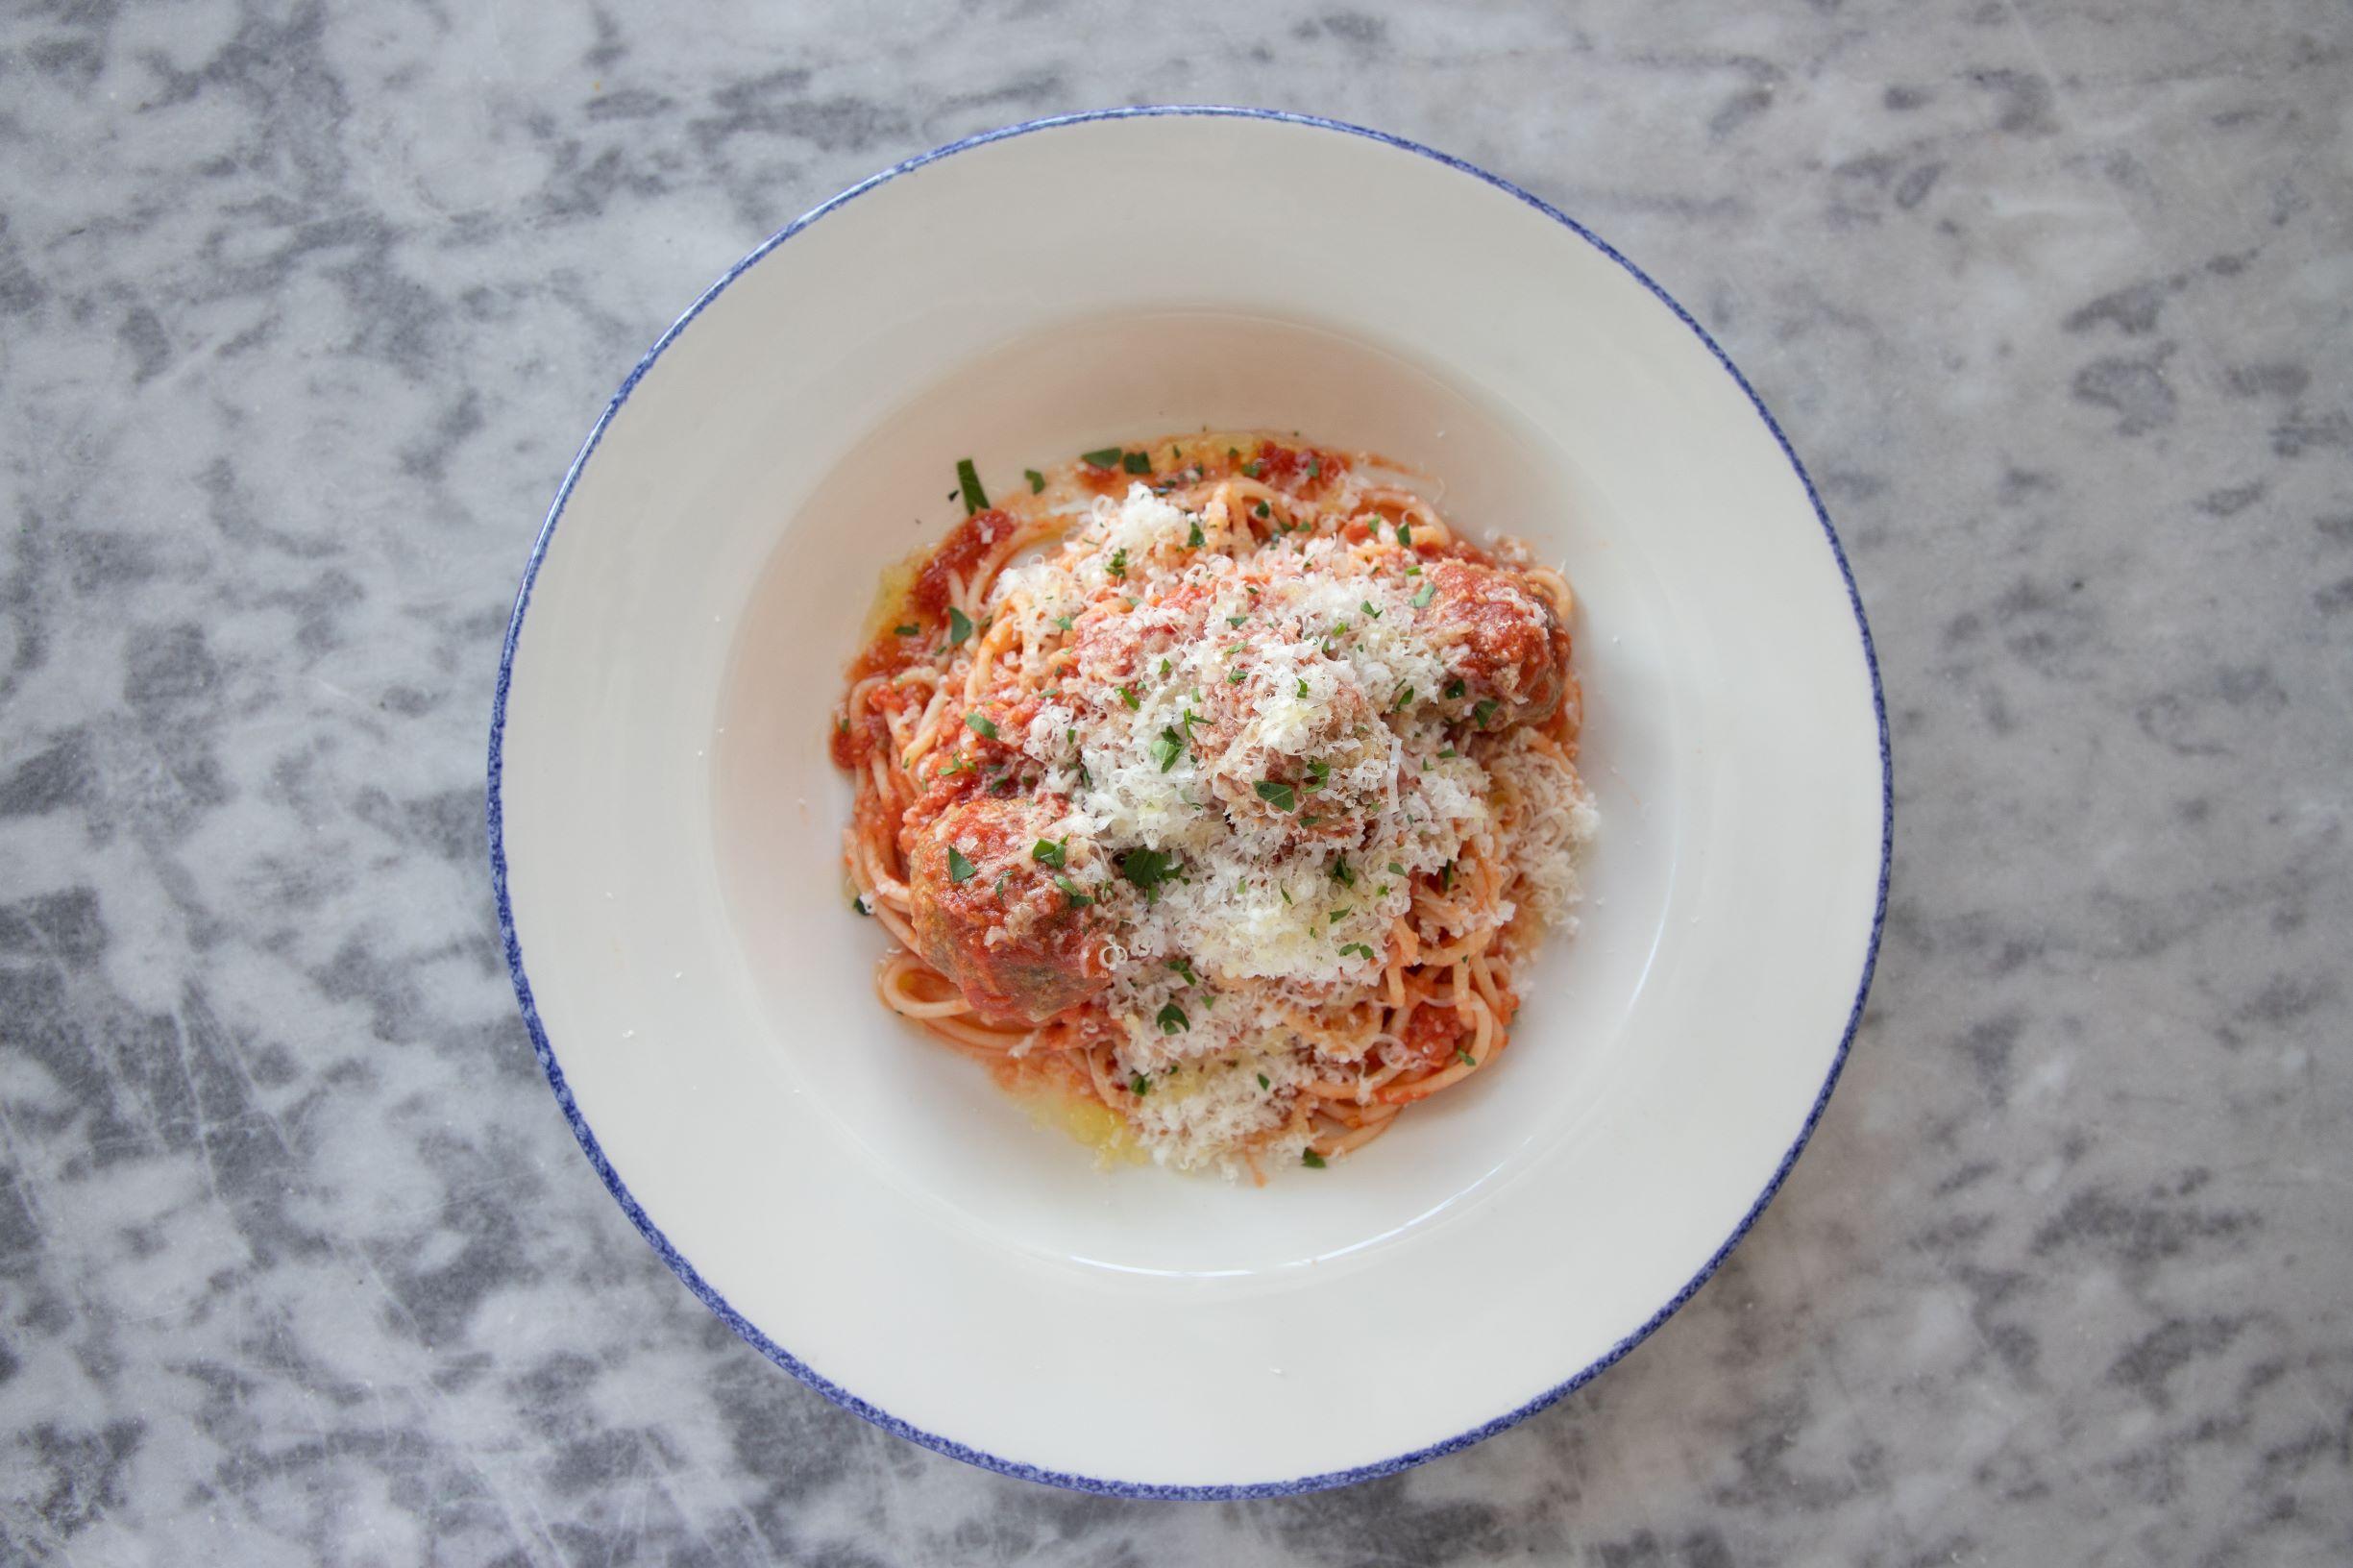 fresh spaghetti with nicli's pork and beef meatballs